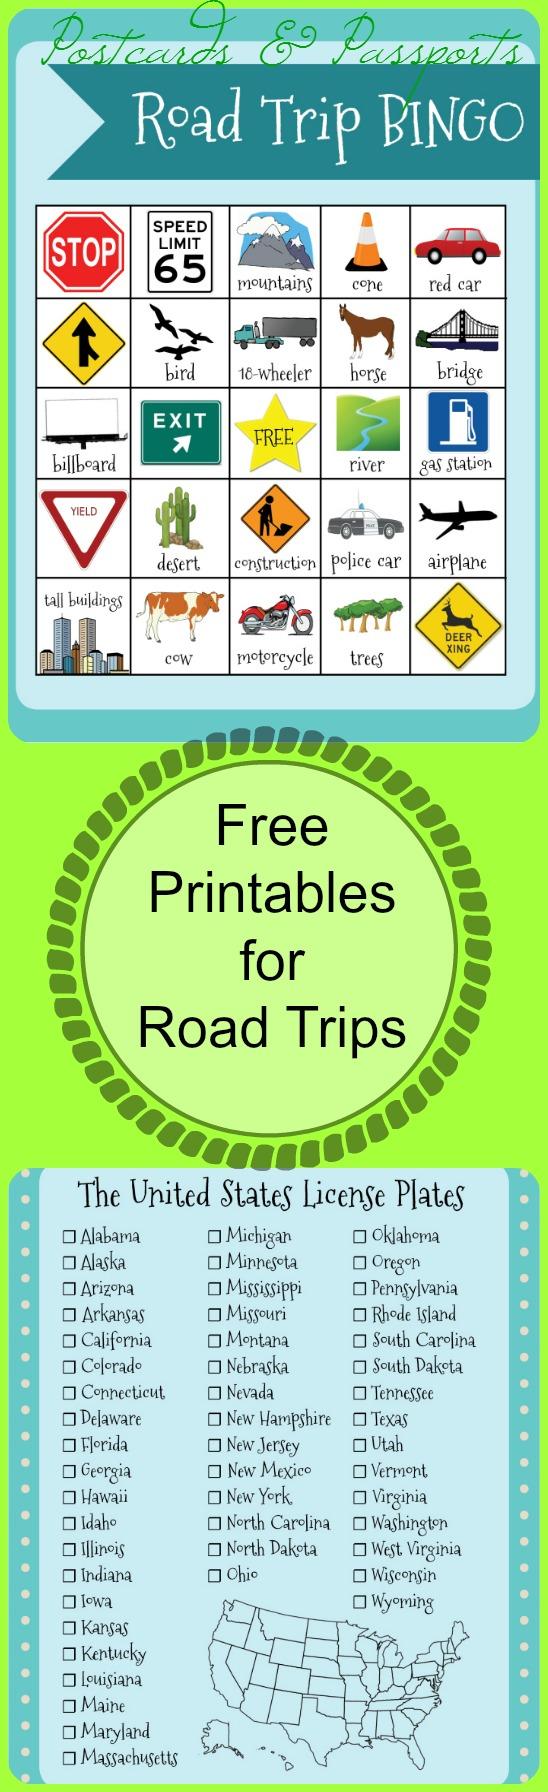 Road Trip - Keeping the Kids Happy